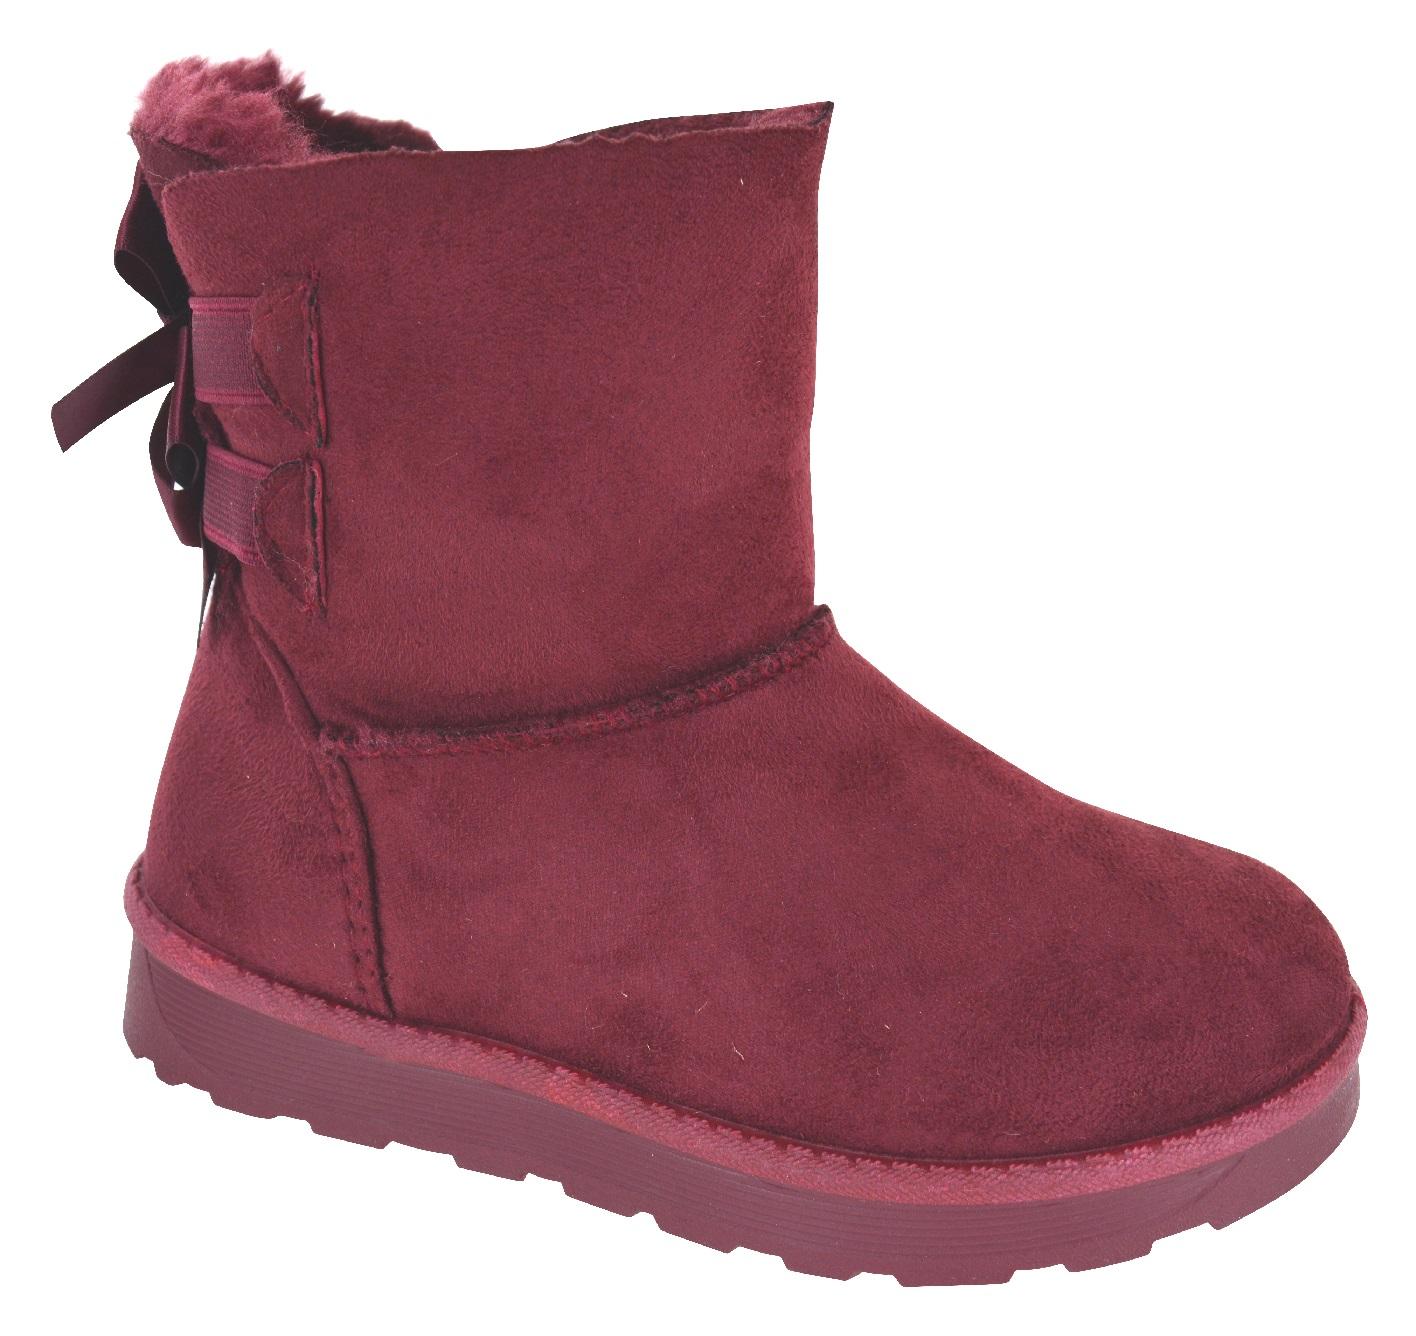 NEW GIRLS KIDS WARM ANKLE GRIP SOLE SNOW SNUGG WINTER CHILDREN BOOTS SIZE 10-2